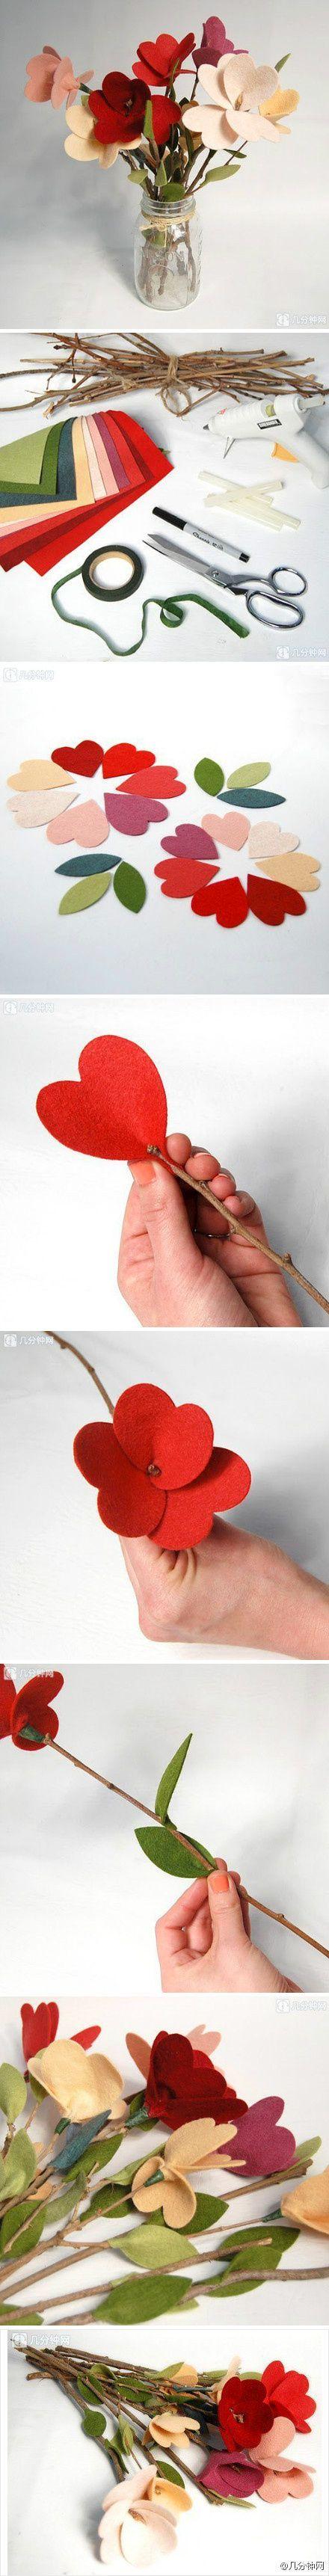 DIY Flowers- so cute and they won't die!